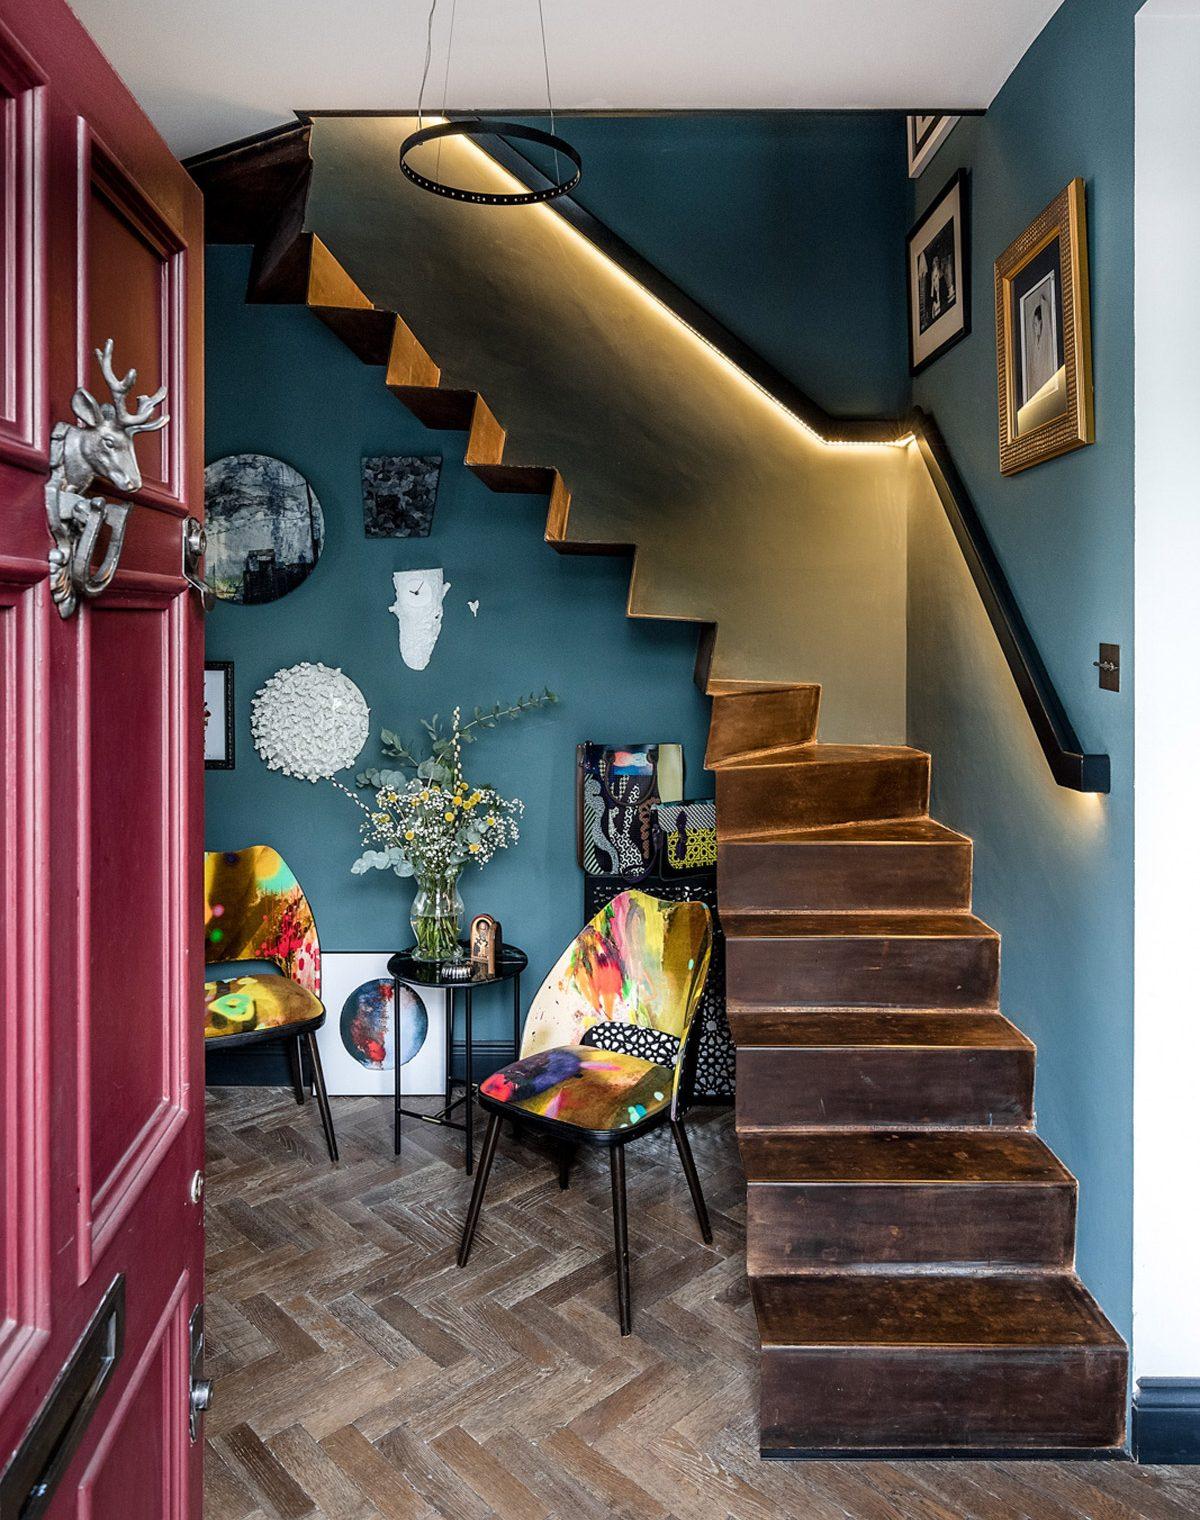 Angel O'Donnell Interiors for SBID Interior Design Blog (3)